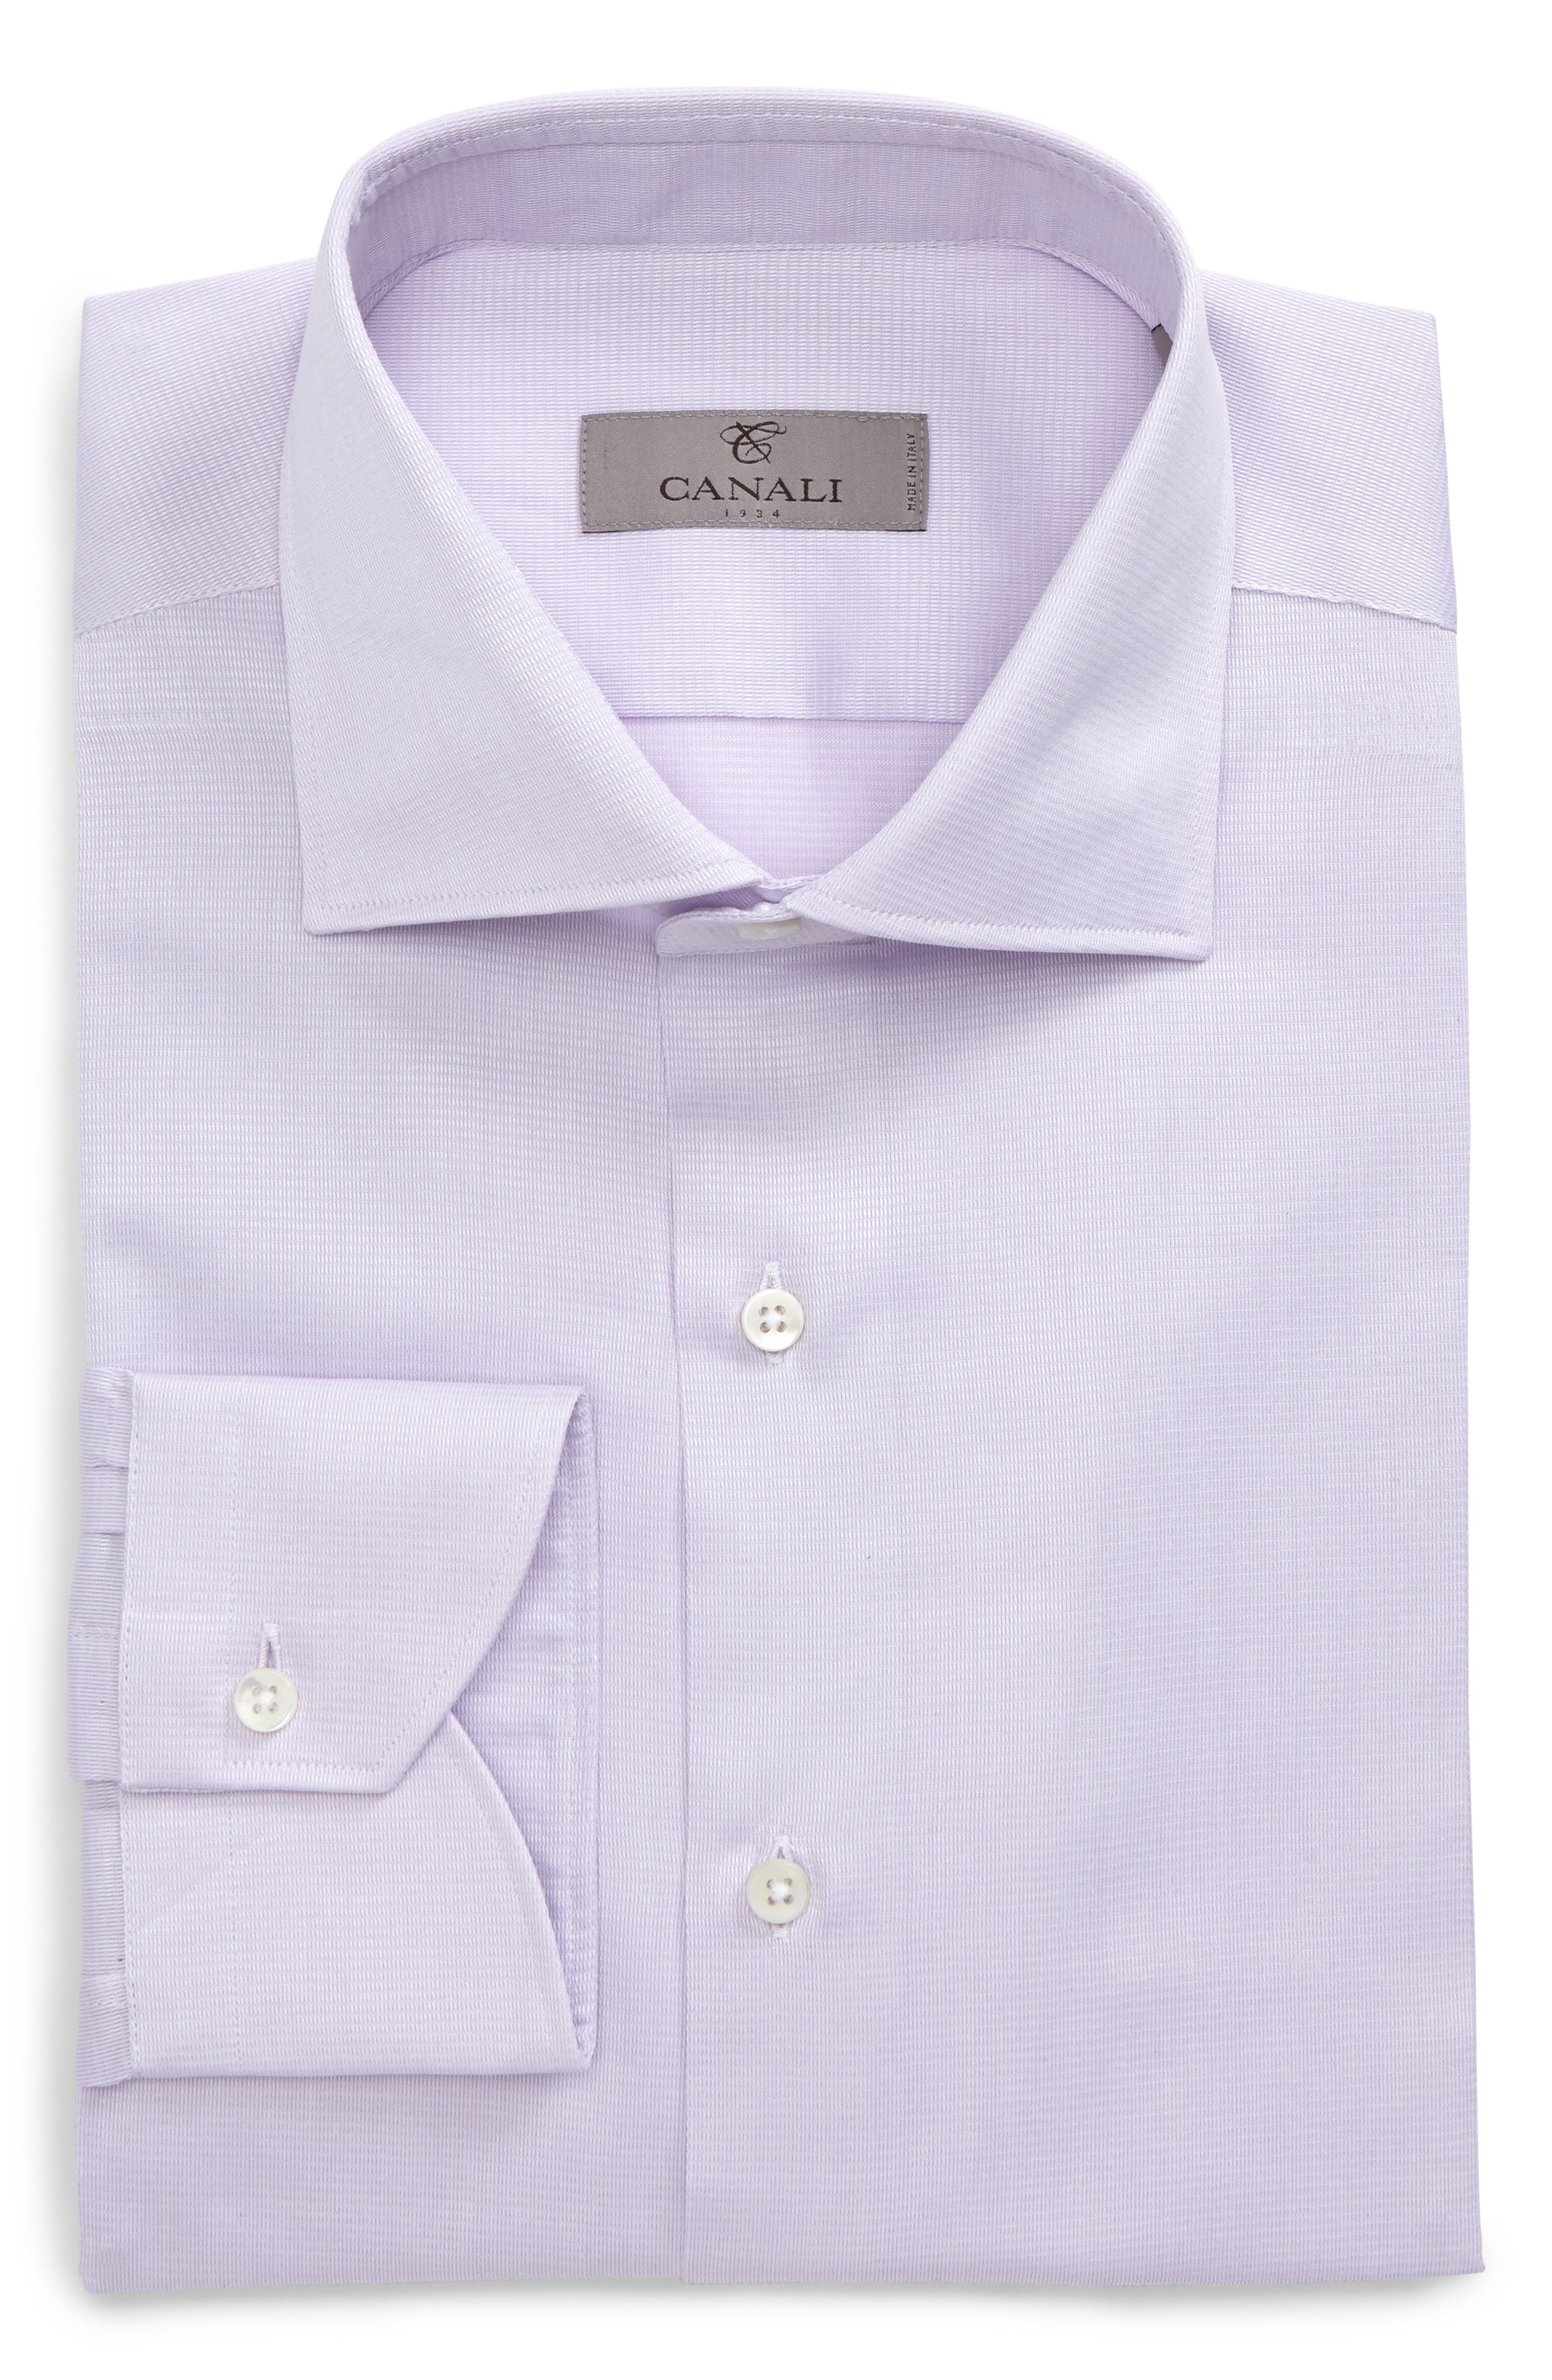 Regular Fit Dress Shirt,                         Main,                         color,